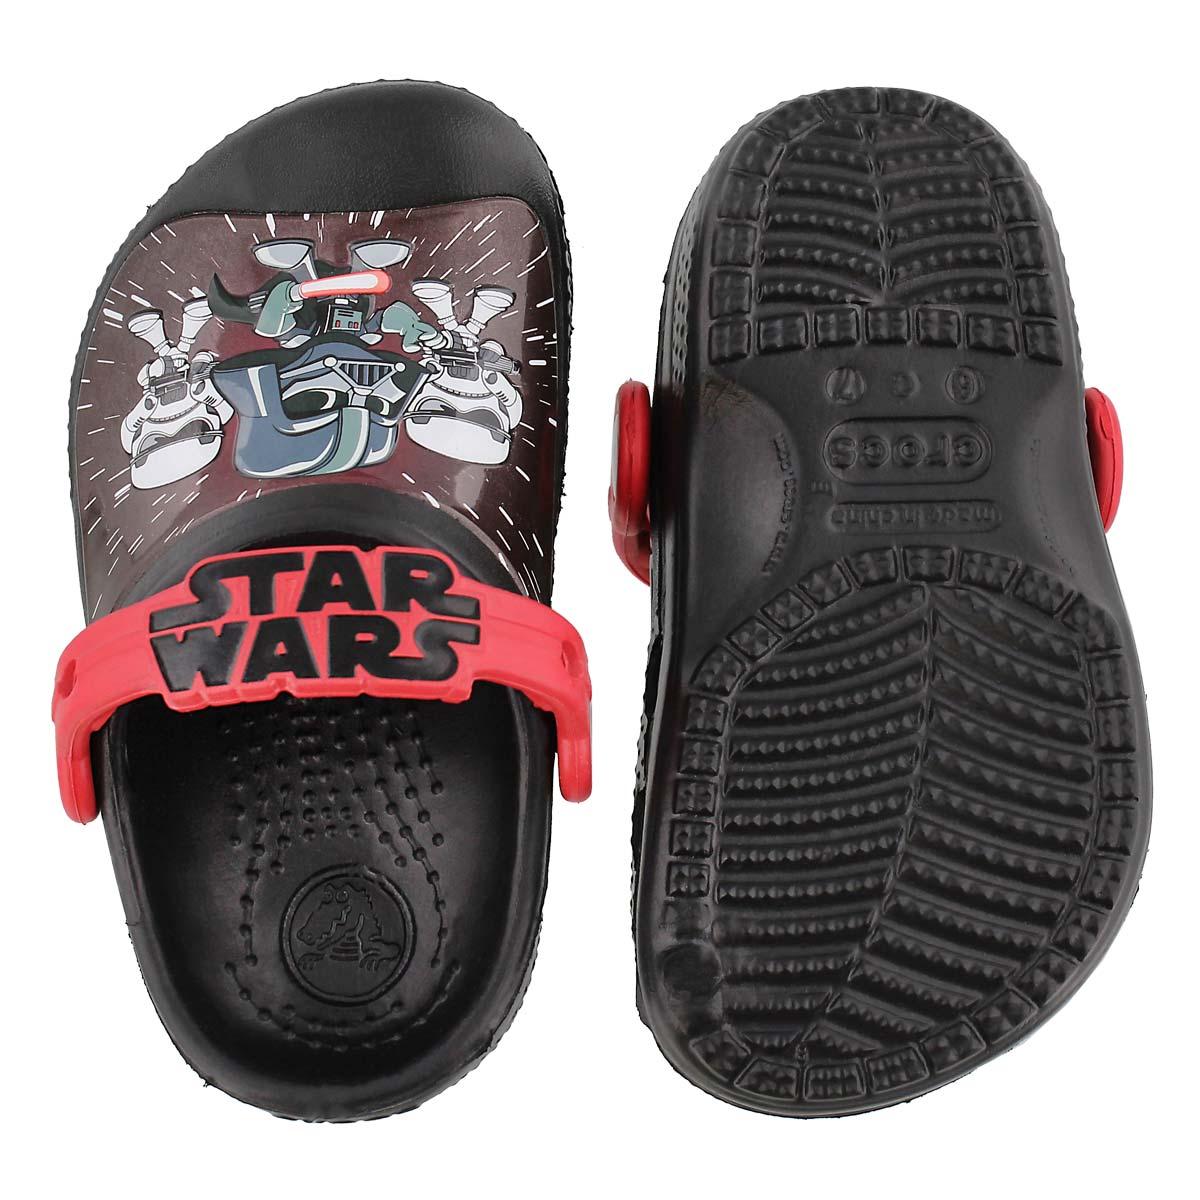 Sabots Star Wars Darth Vader, noir, gar